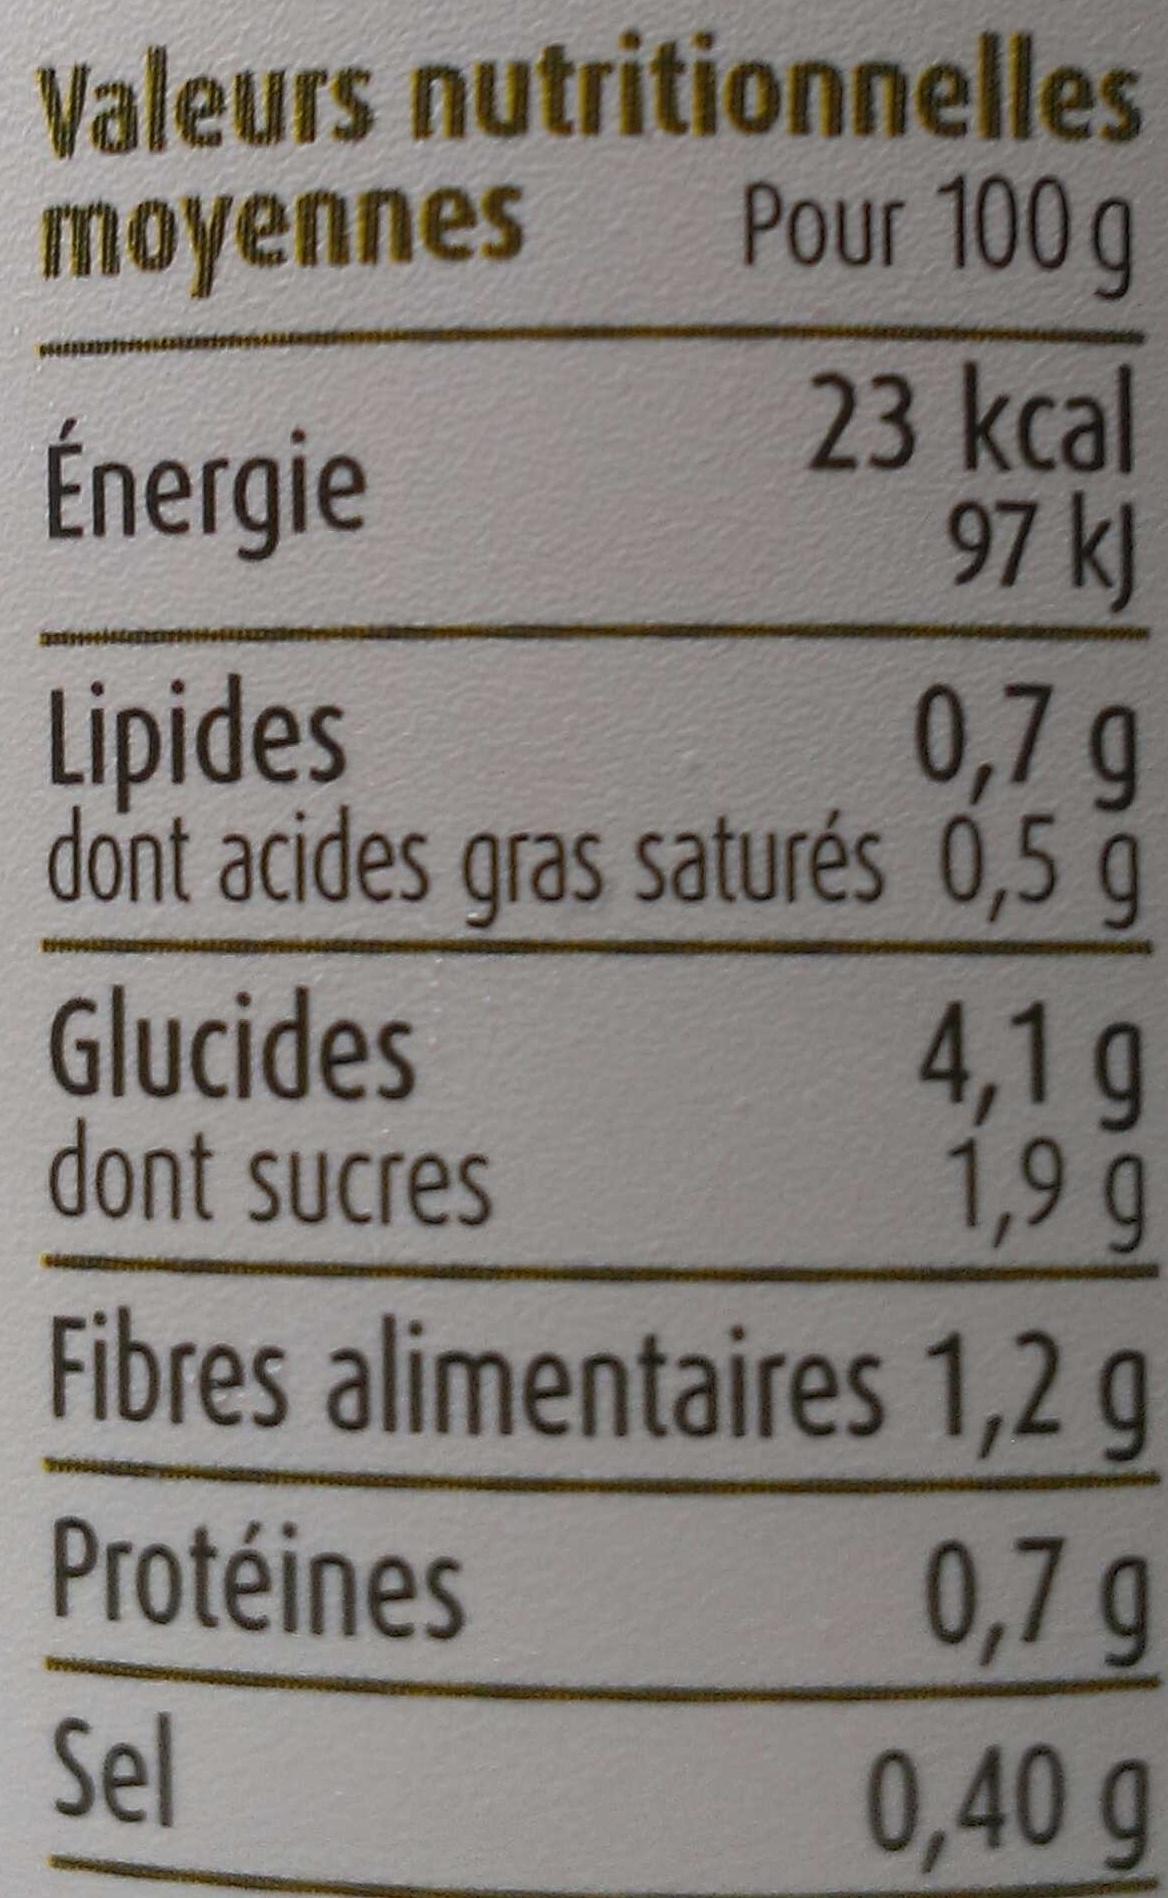 Butternut & Piment d'Espelette - Voedingswaarden - fr